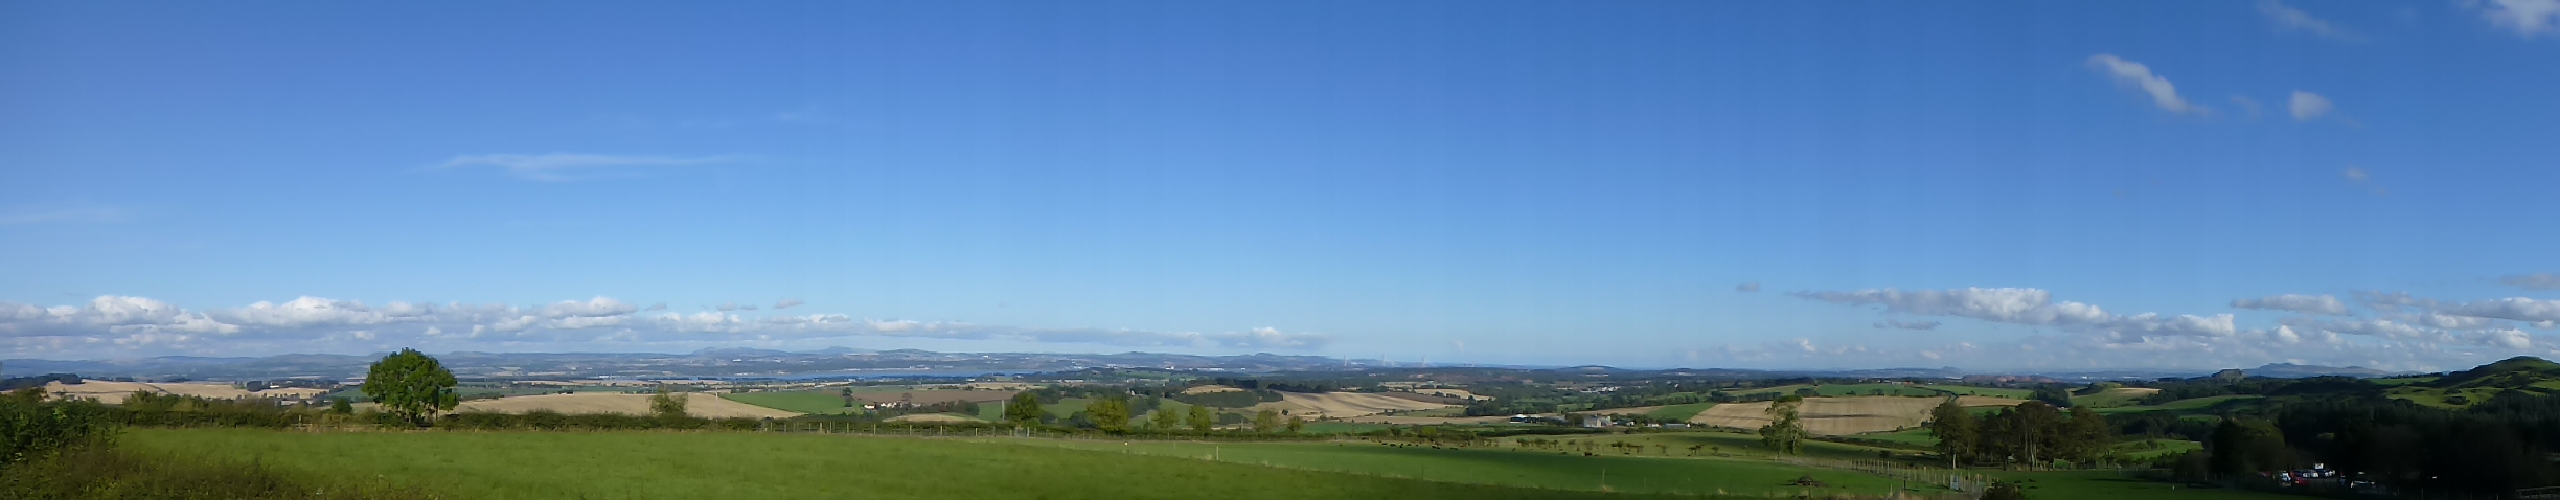 Beecraigs - Beecraigs Hill